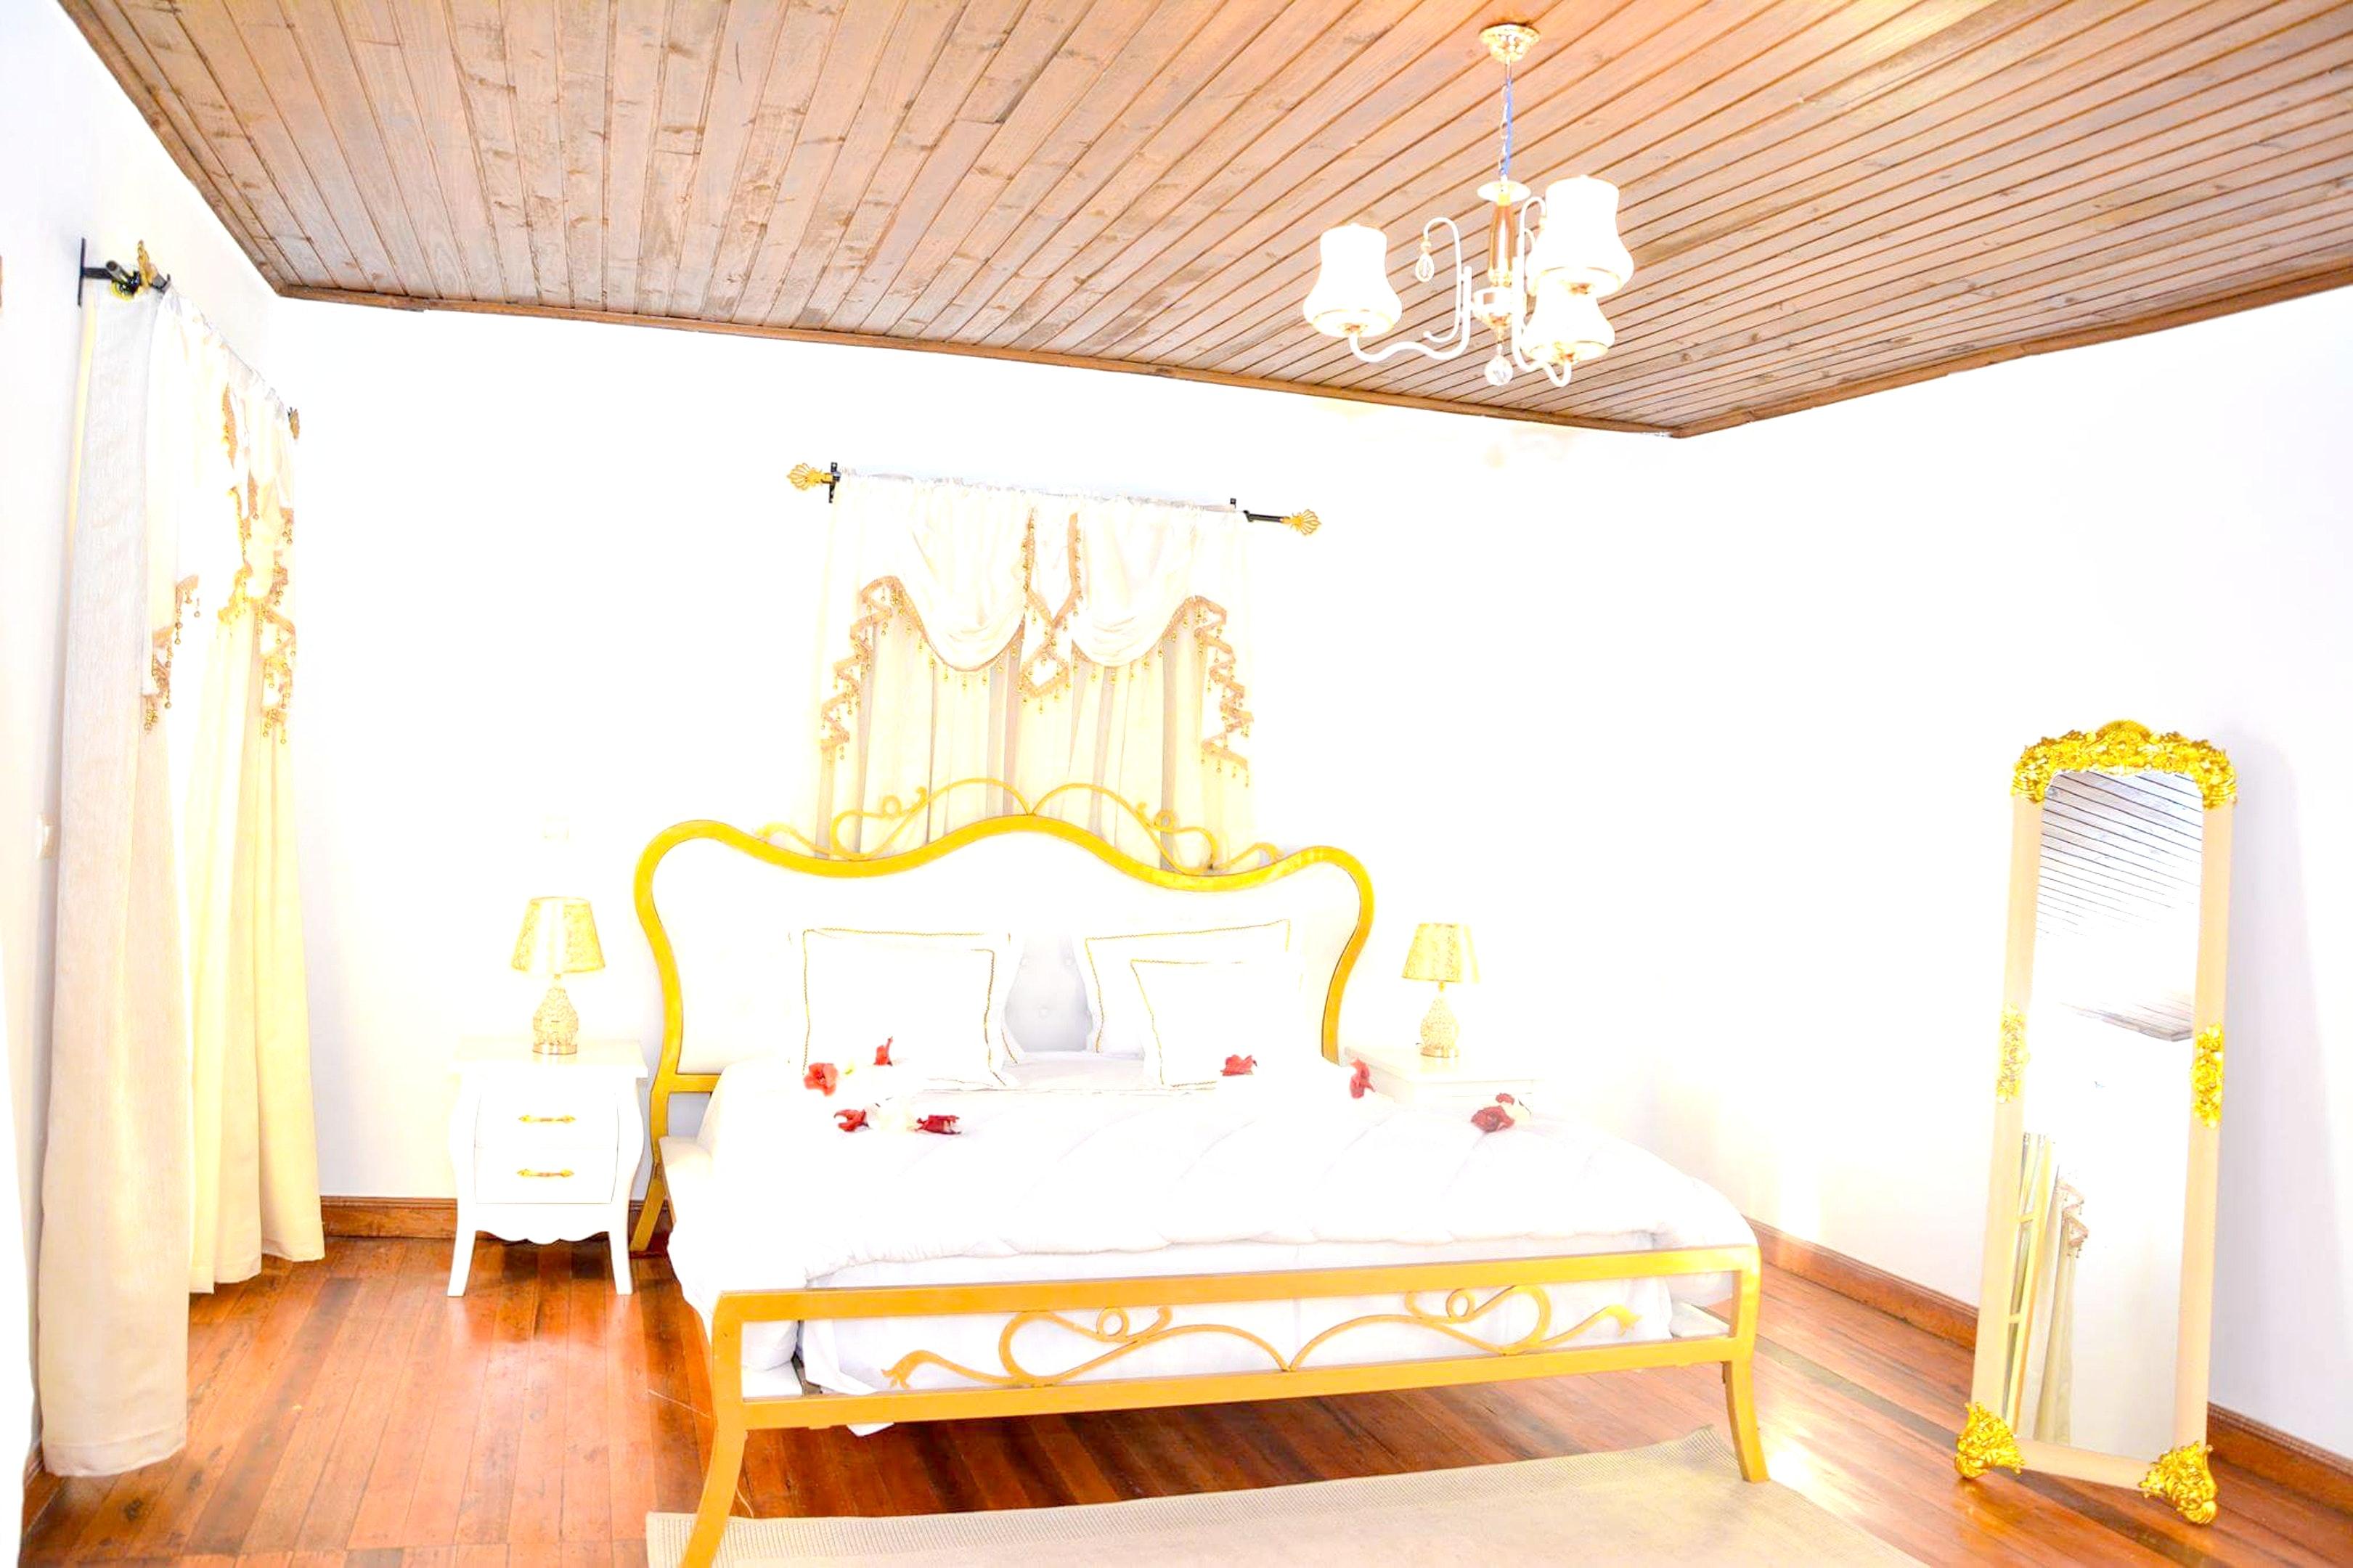 Haus mit 2 Schlafzimmern in Ambohimitsimbina mit s Ferienhaus in Afrika